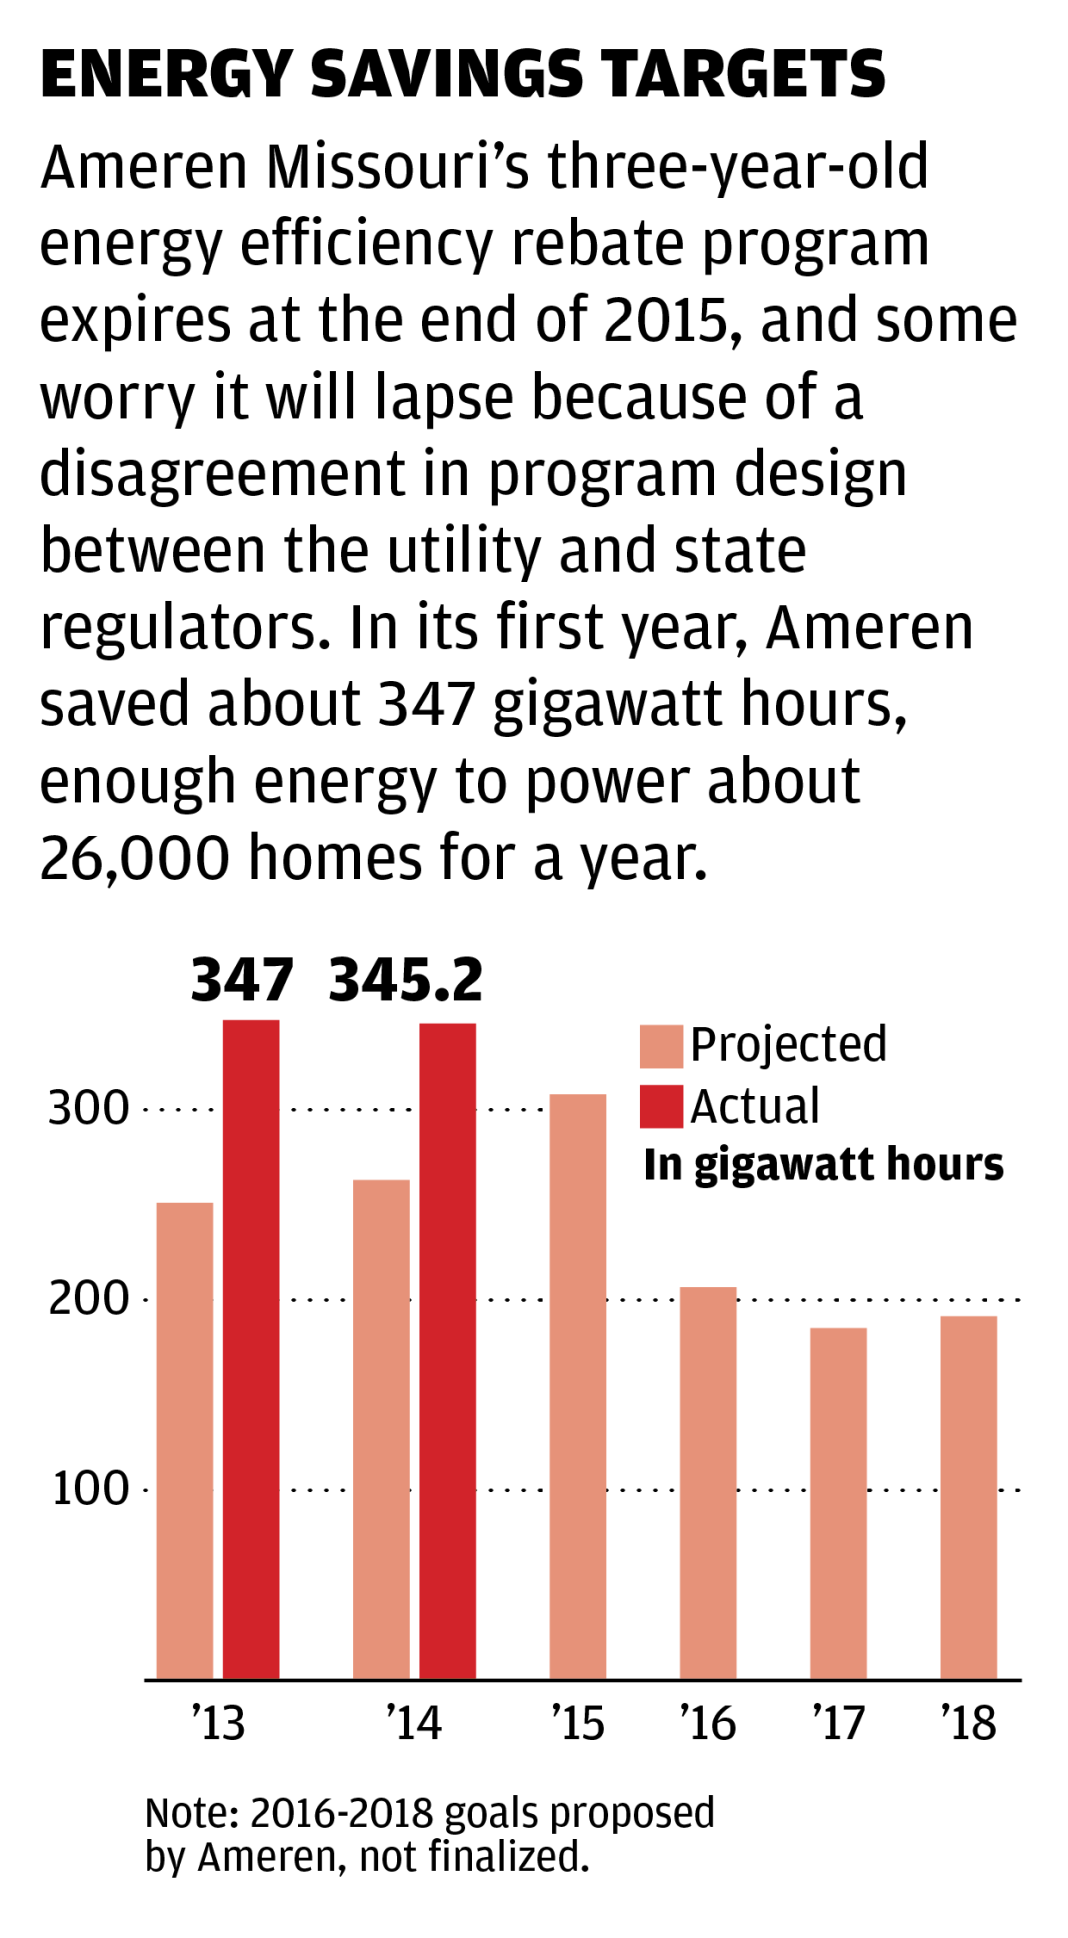 Chart: Energy savings targets